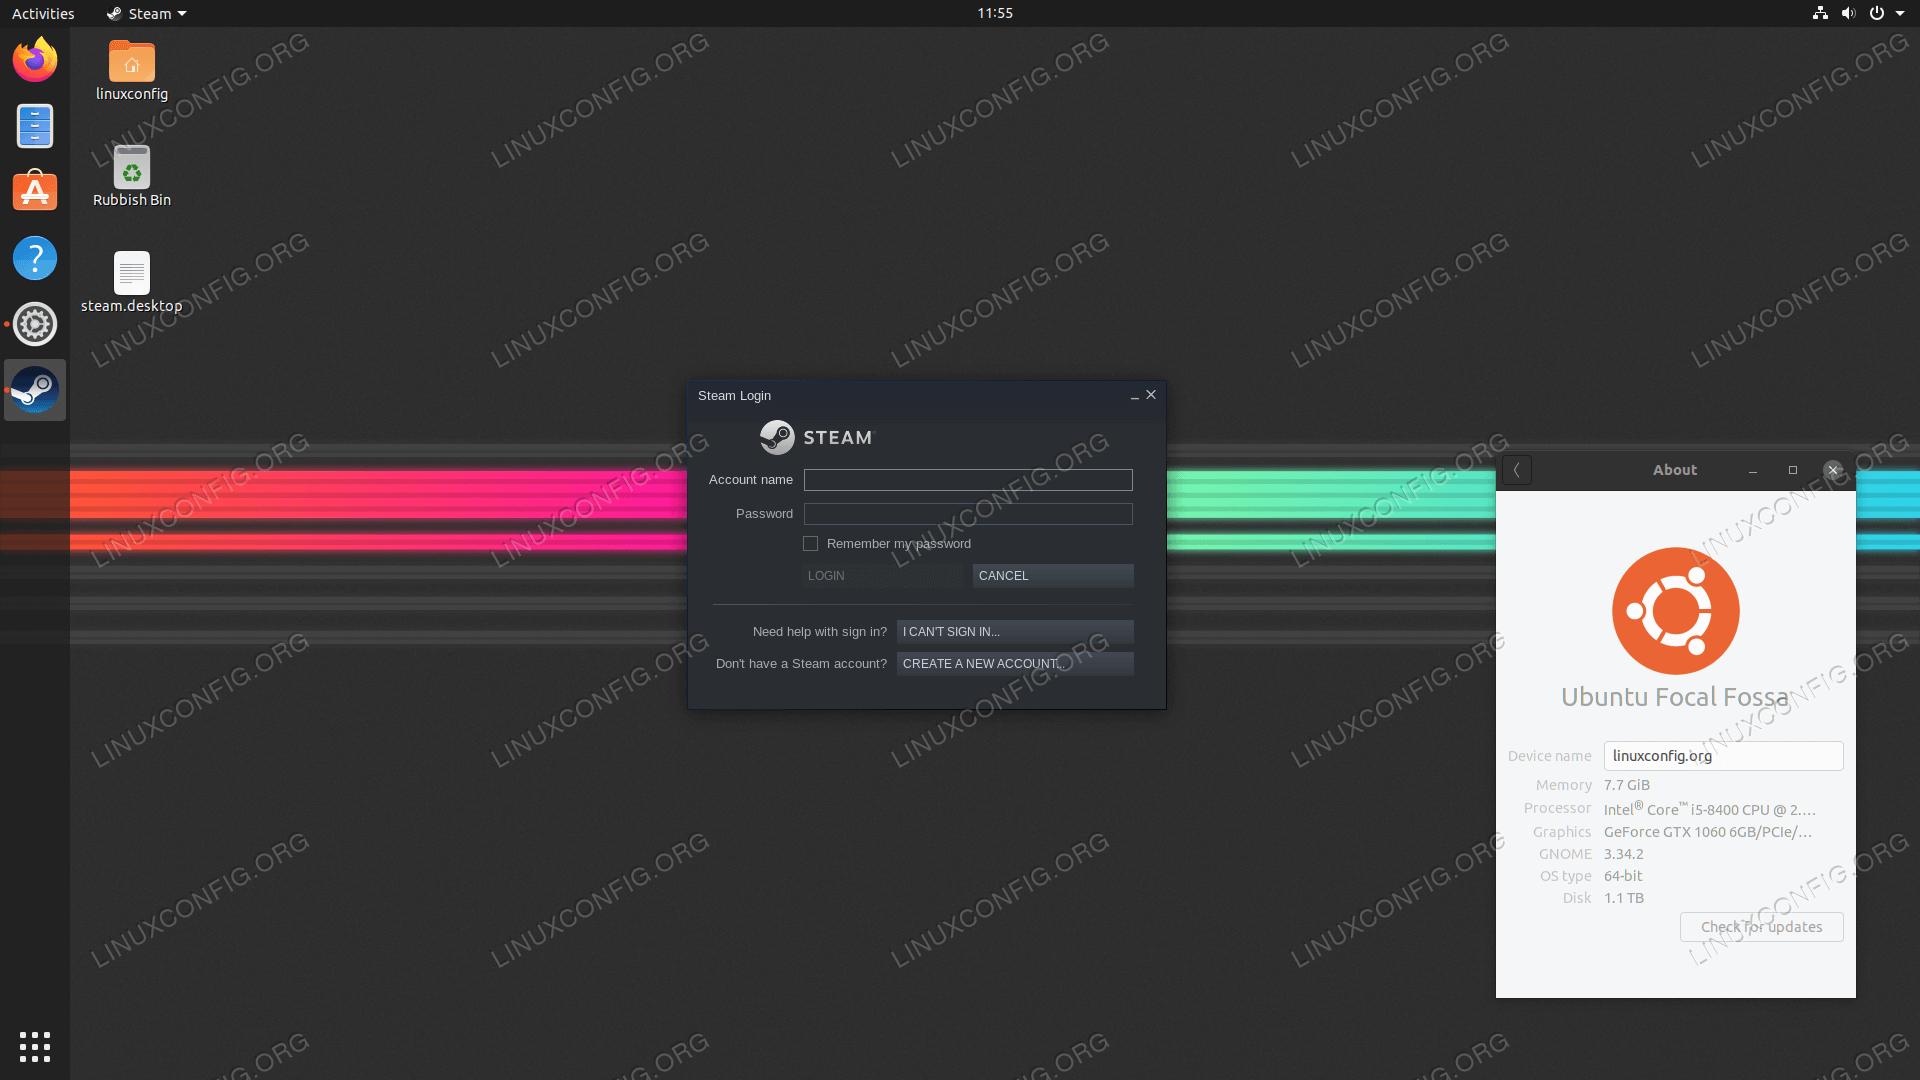 Steam on Ubuntu 20.04 Focal Fossa Linux